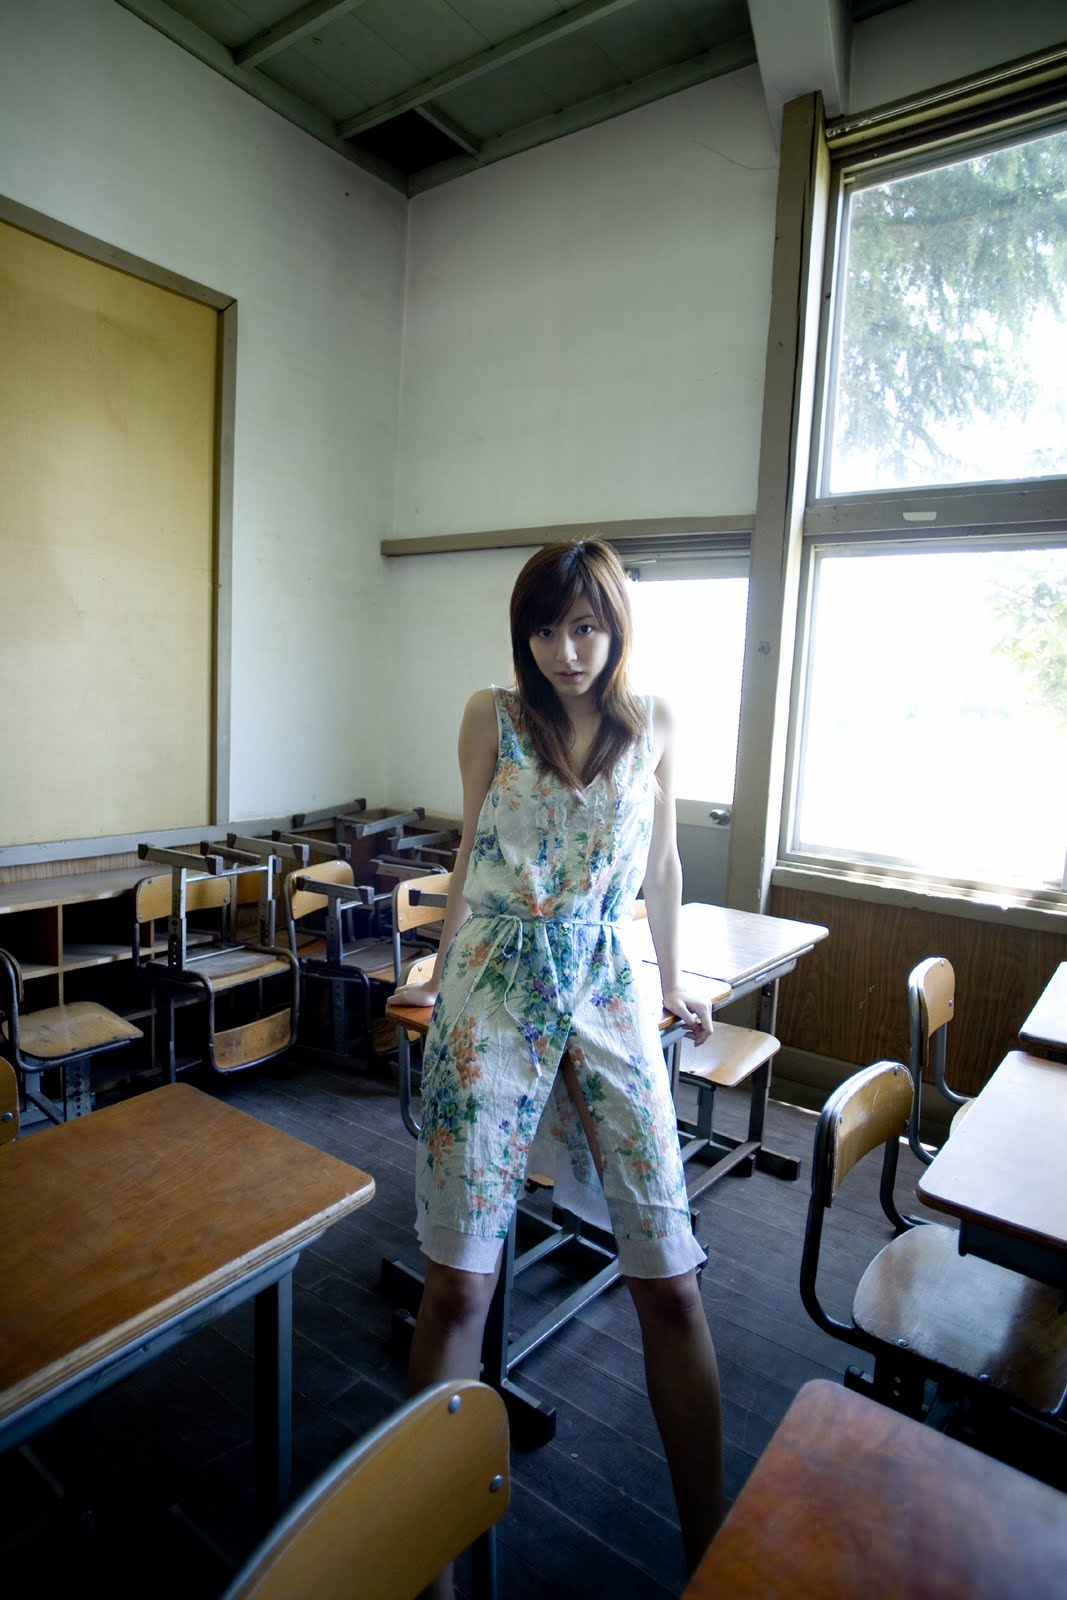 Yumi Sugimoto In Class Room  Asian Girls Sexy-6653